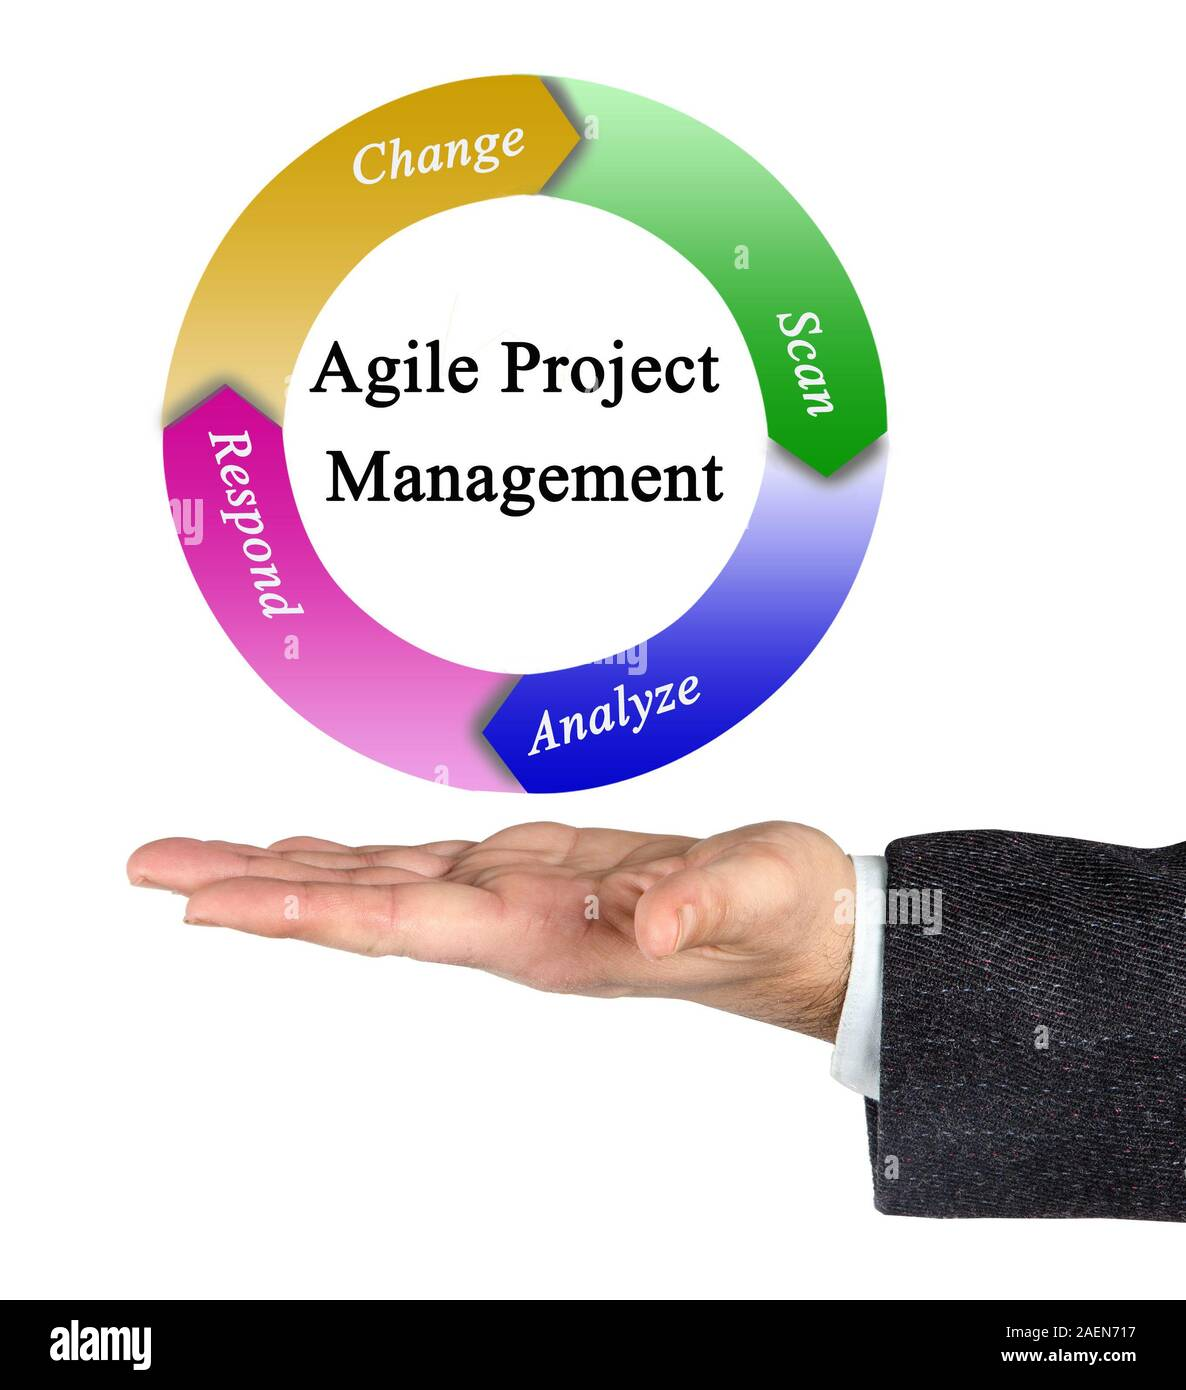 Agile Management agile management cut out stock images & pictures - alamy